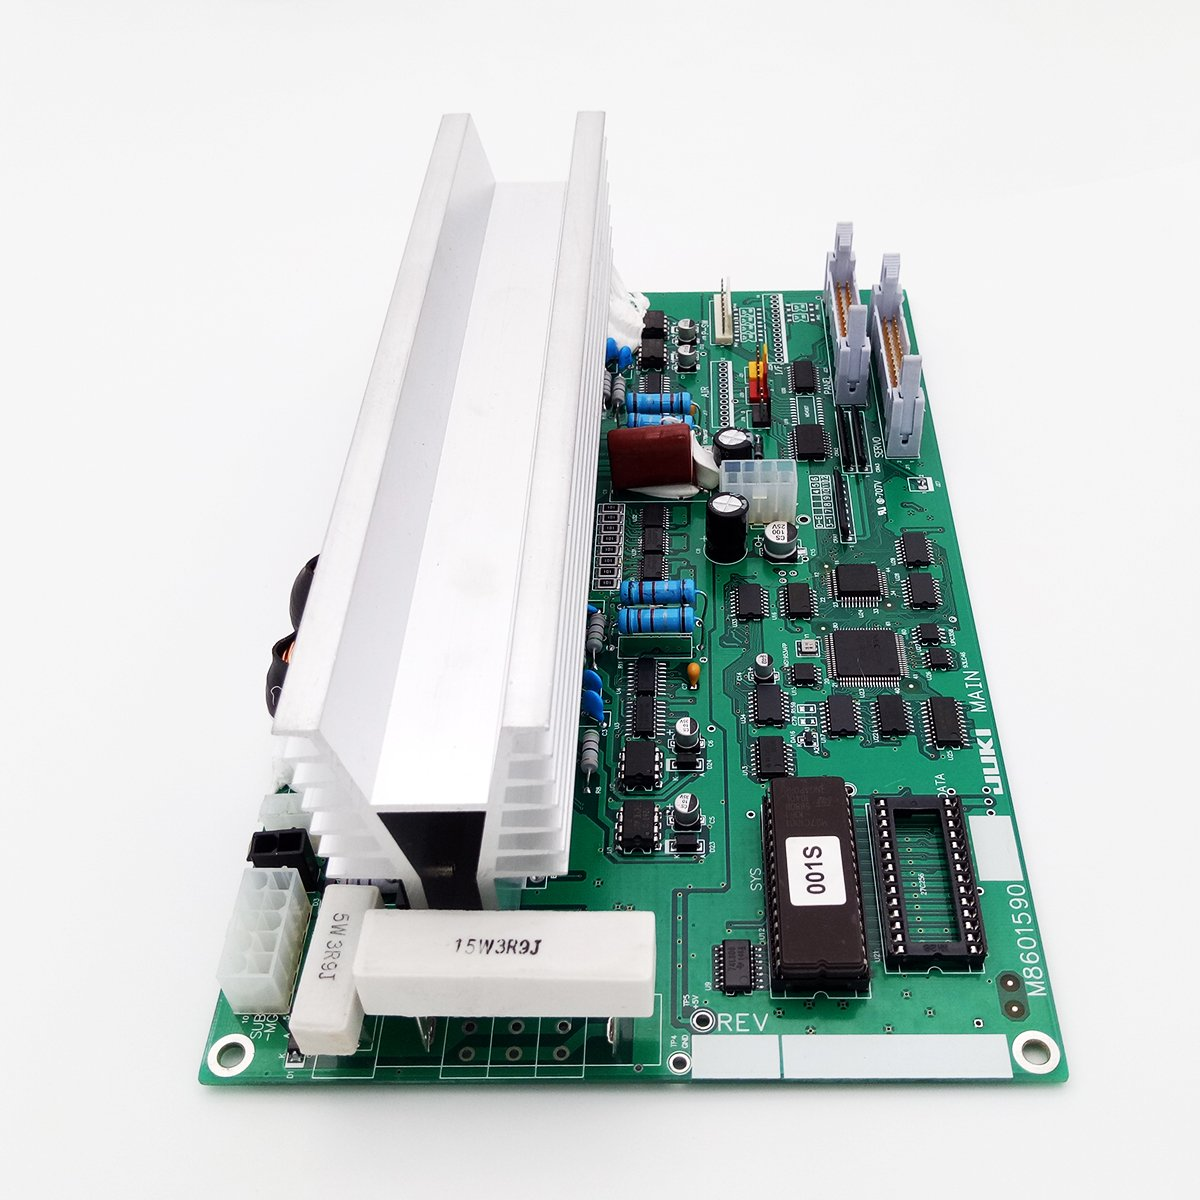 Kunpeng 1pcs M8601 590 Aa0 Main Circuit Board Asm Fit Printed Control For Embroidery Machine Juki Lk 1900